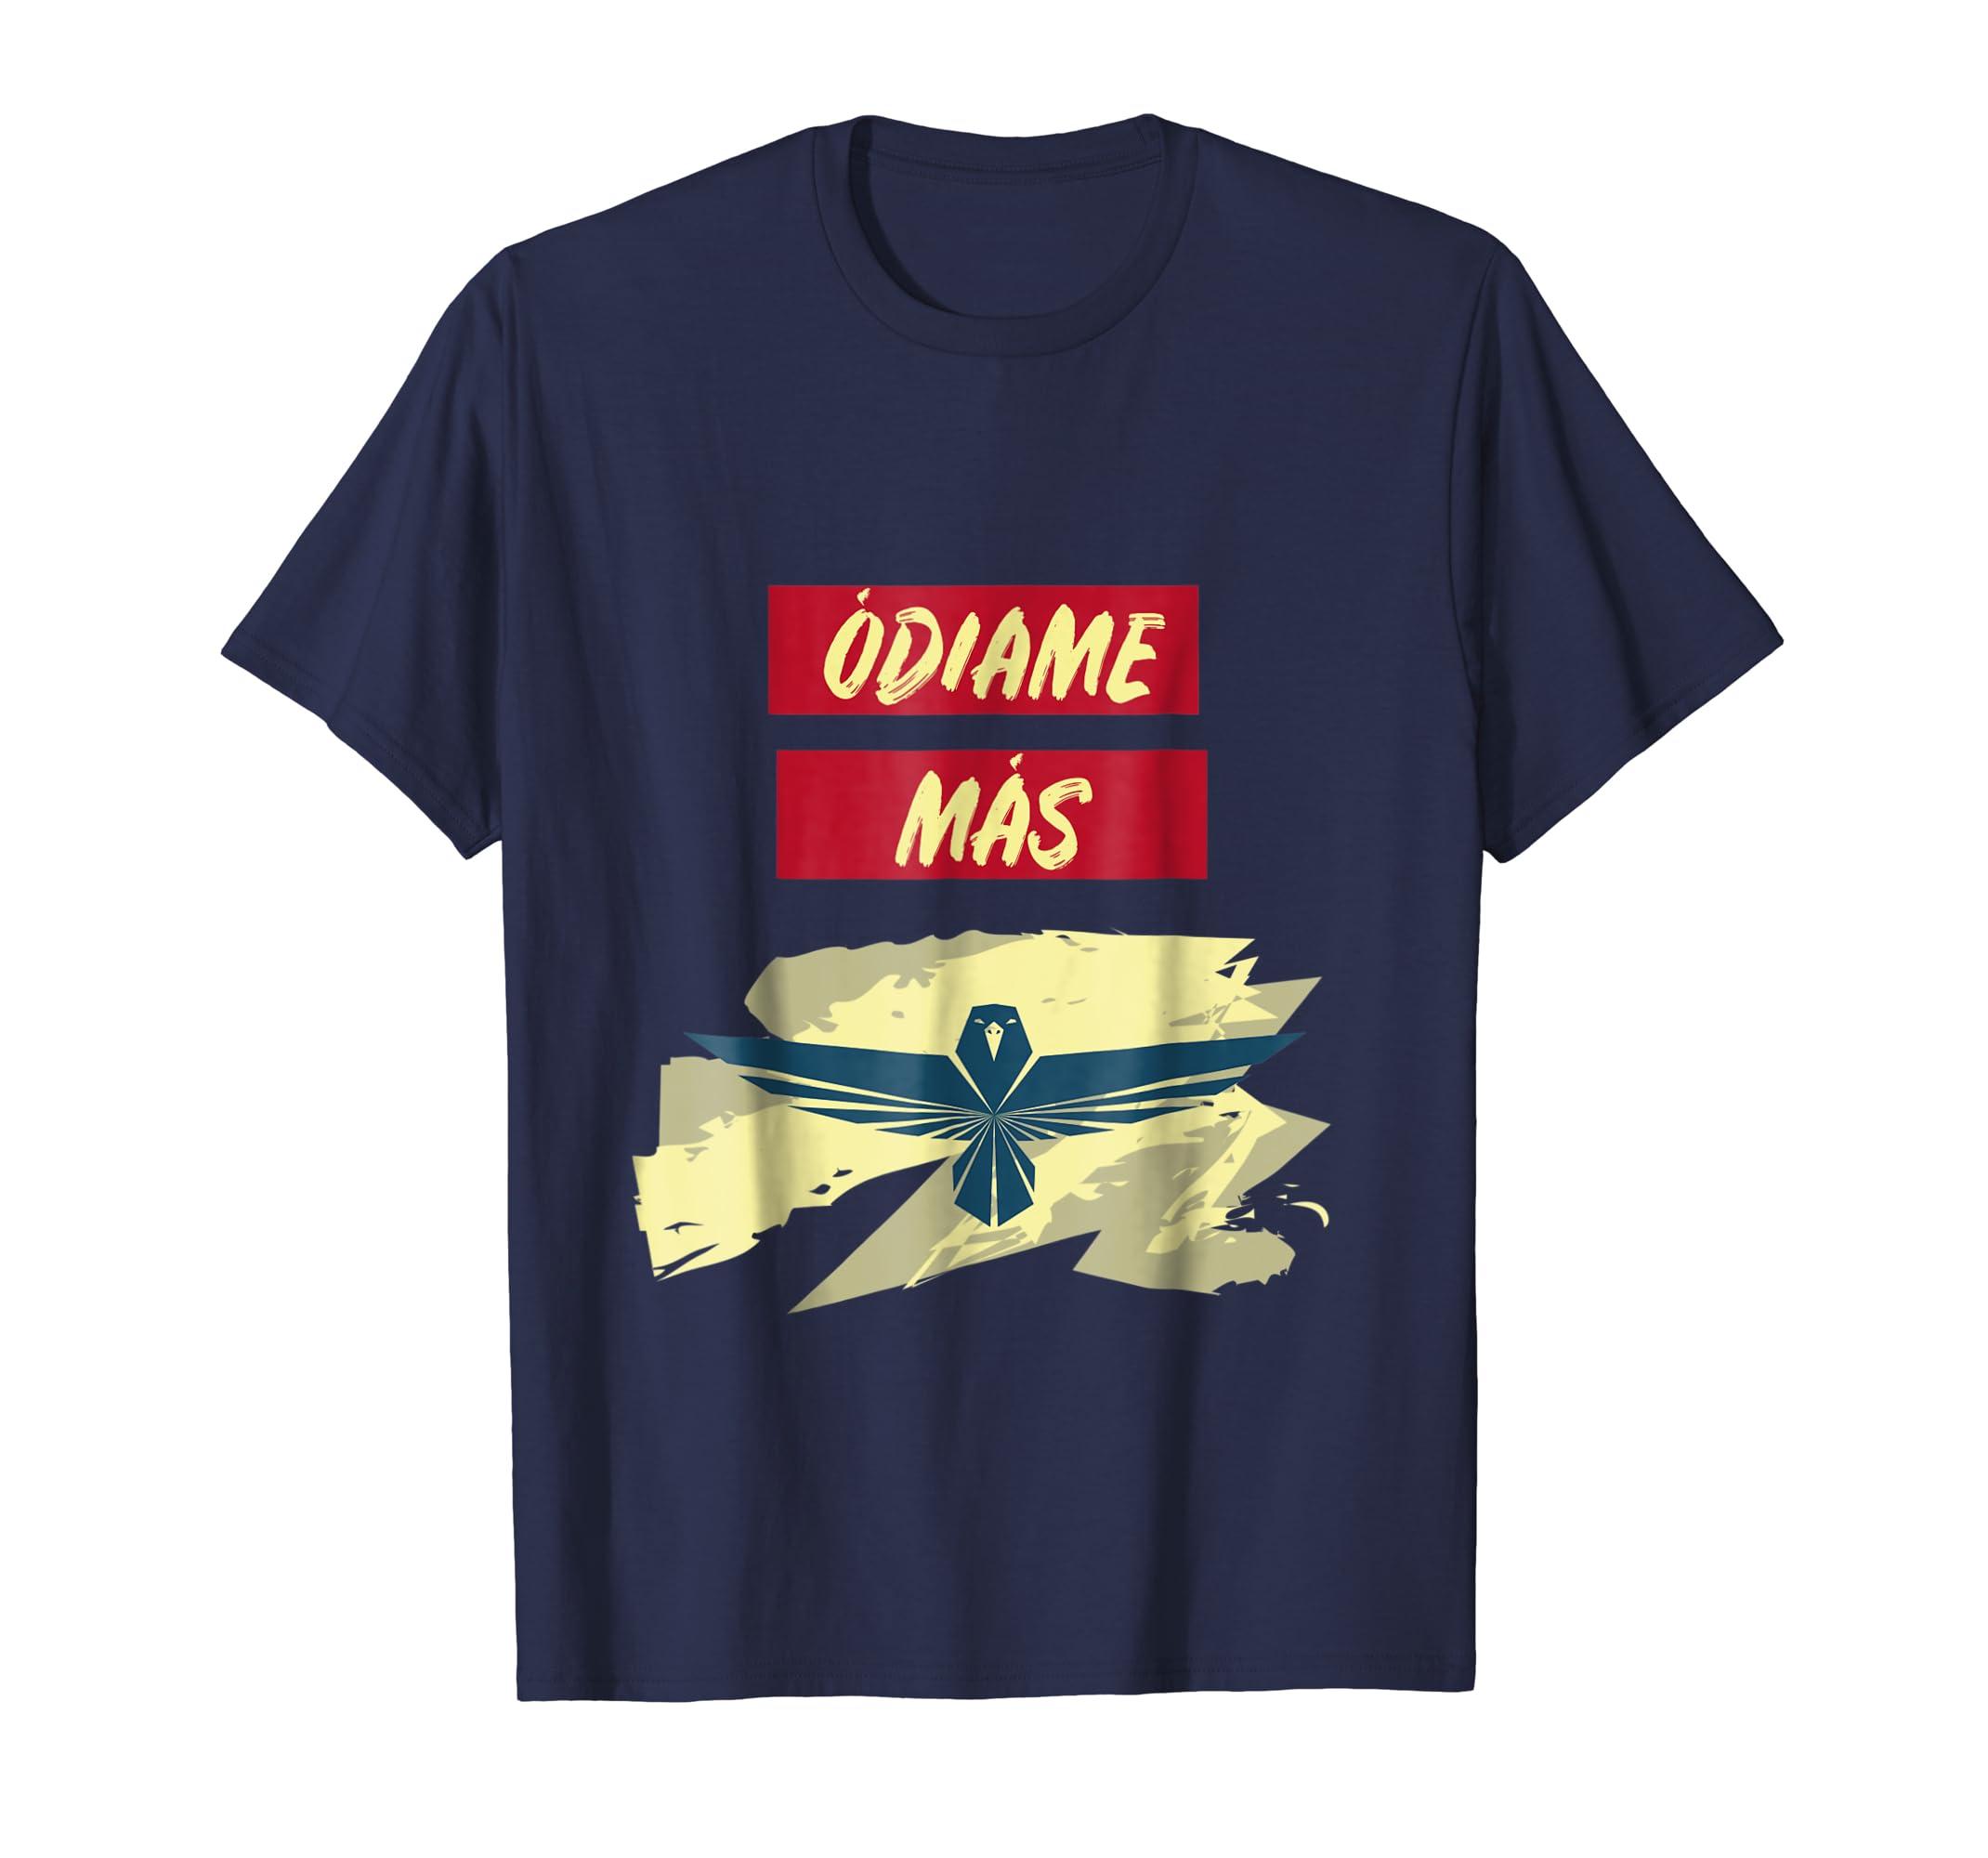 10426f322 Amazon.com  America Fan T-Shirt Odiame Mas  Clothing